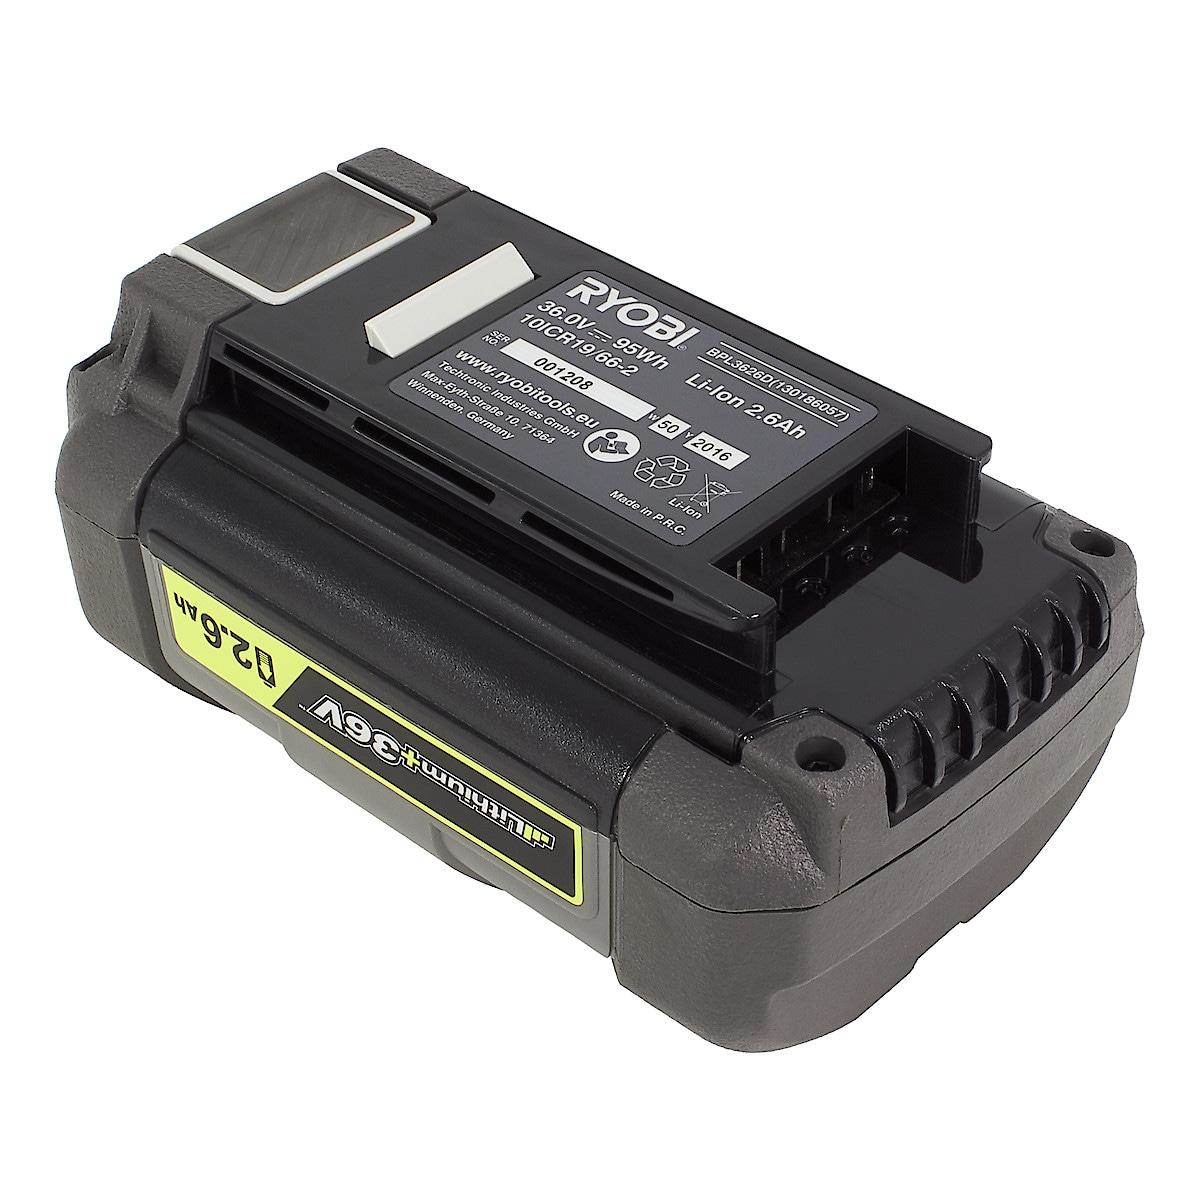 Ryobi BPL3626D batteri 36 V